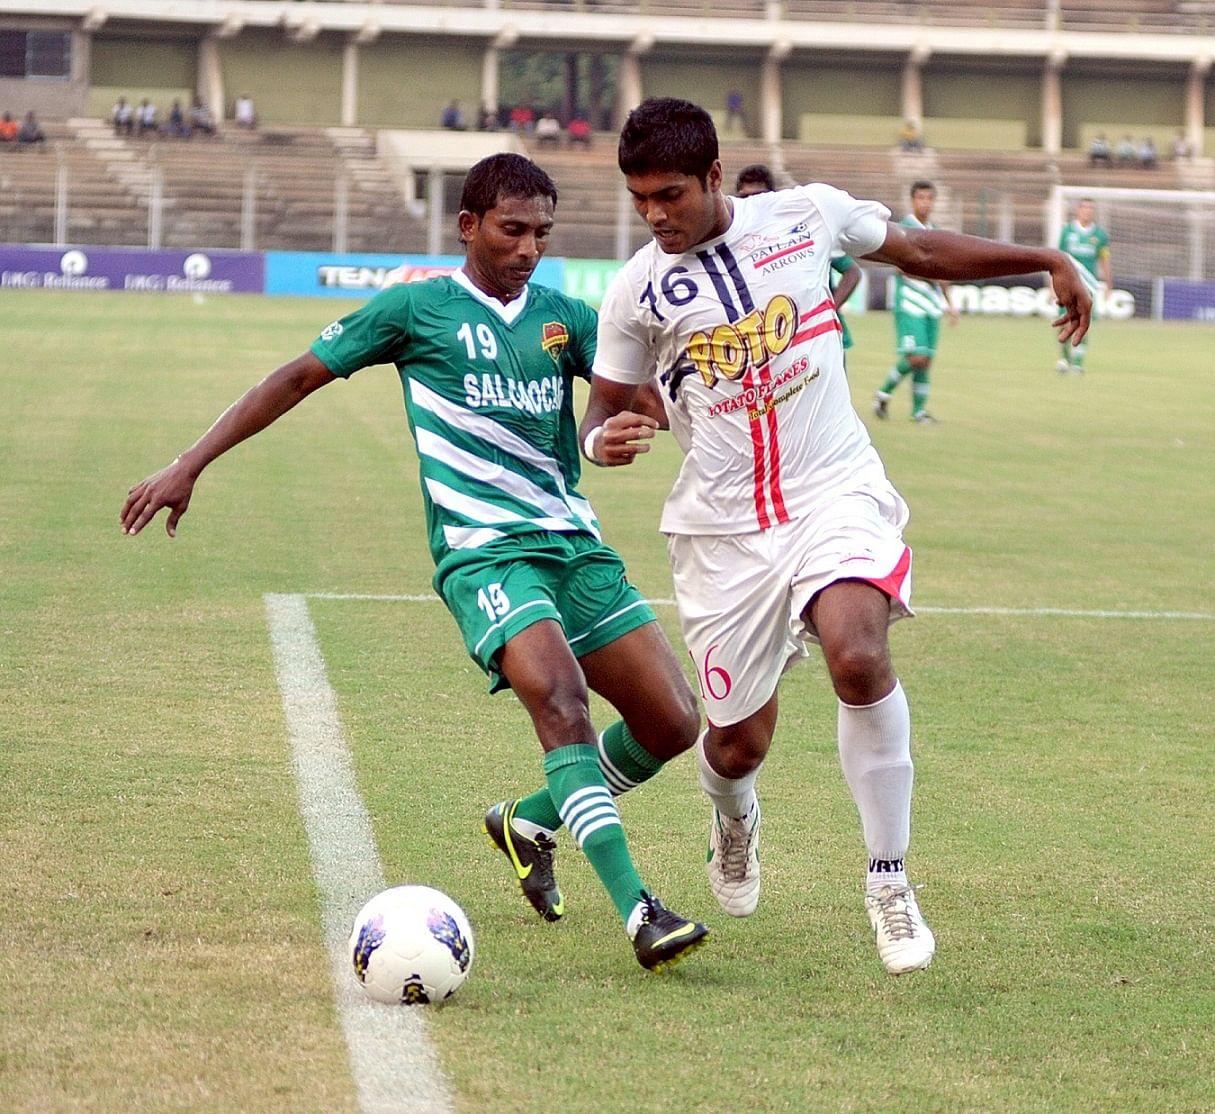 Nicolau Colaco (in green) Photo Credit: Salgaocar FC